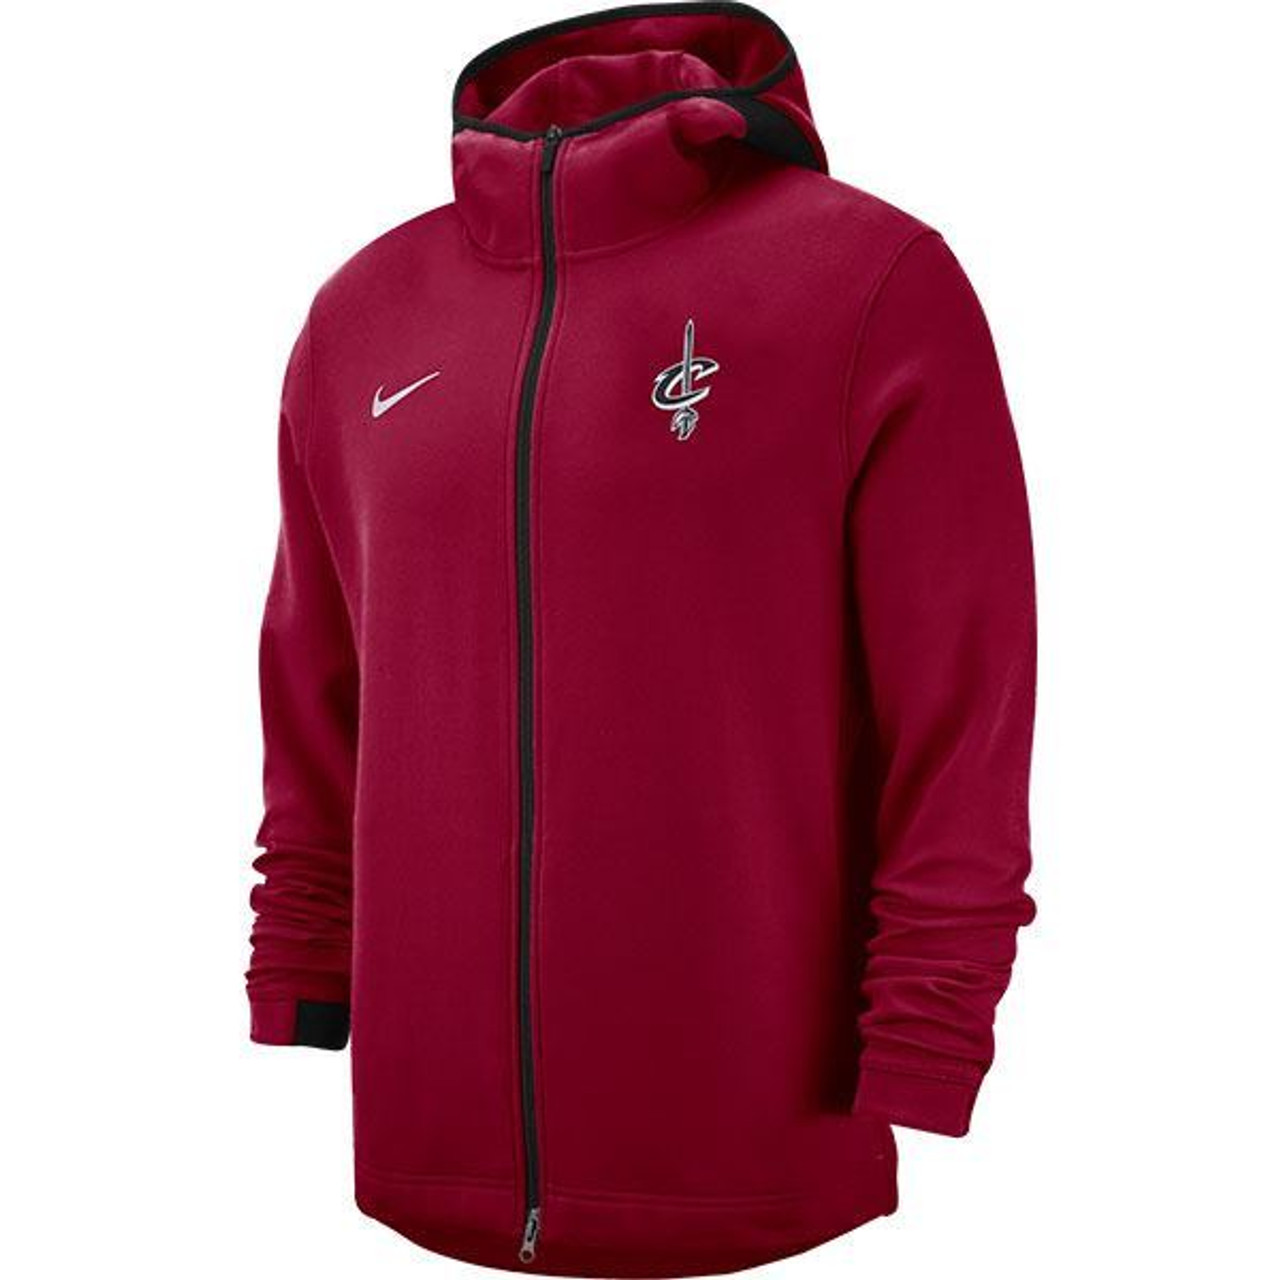 a74f134388e8 Nike Wine Showtime Full Zip Hoodie - Cleveland Cavaliers